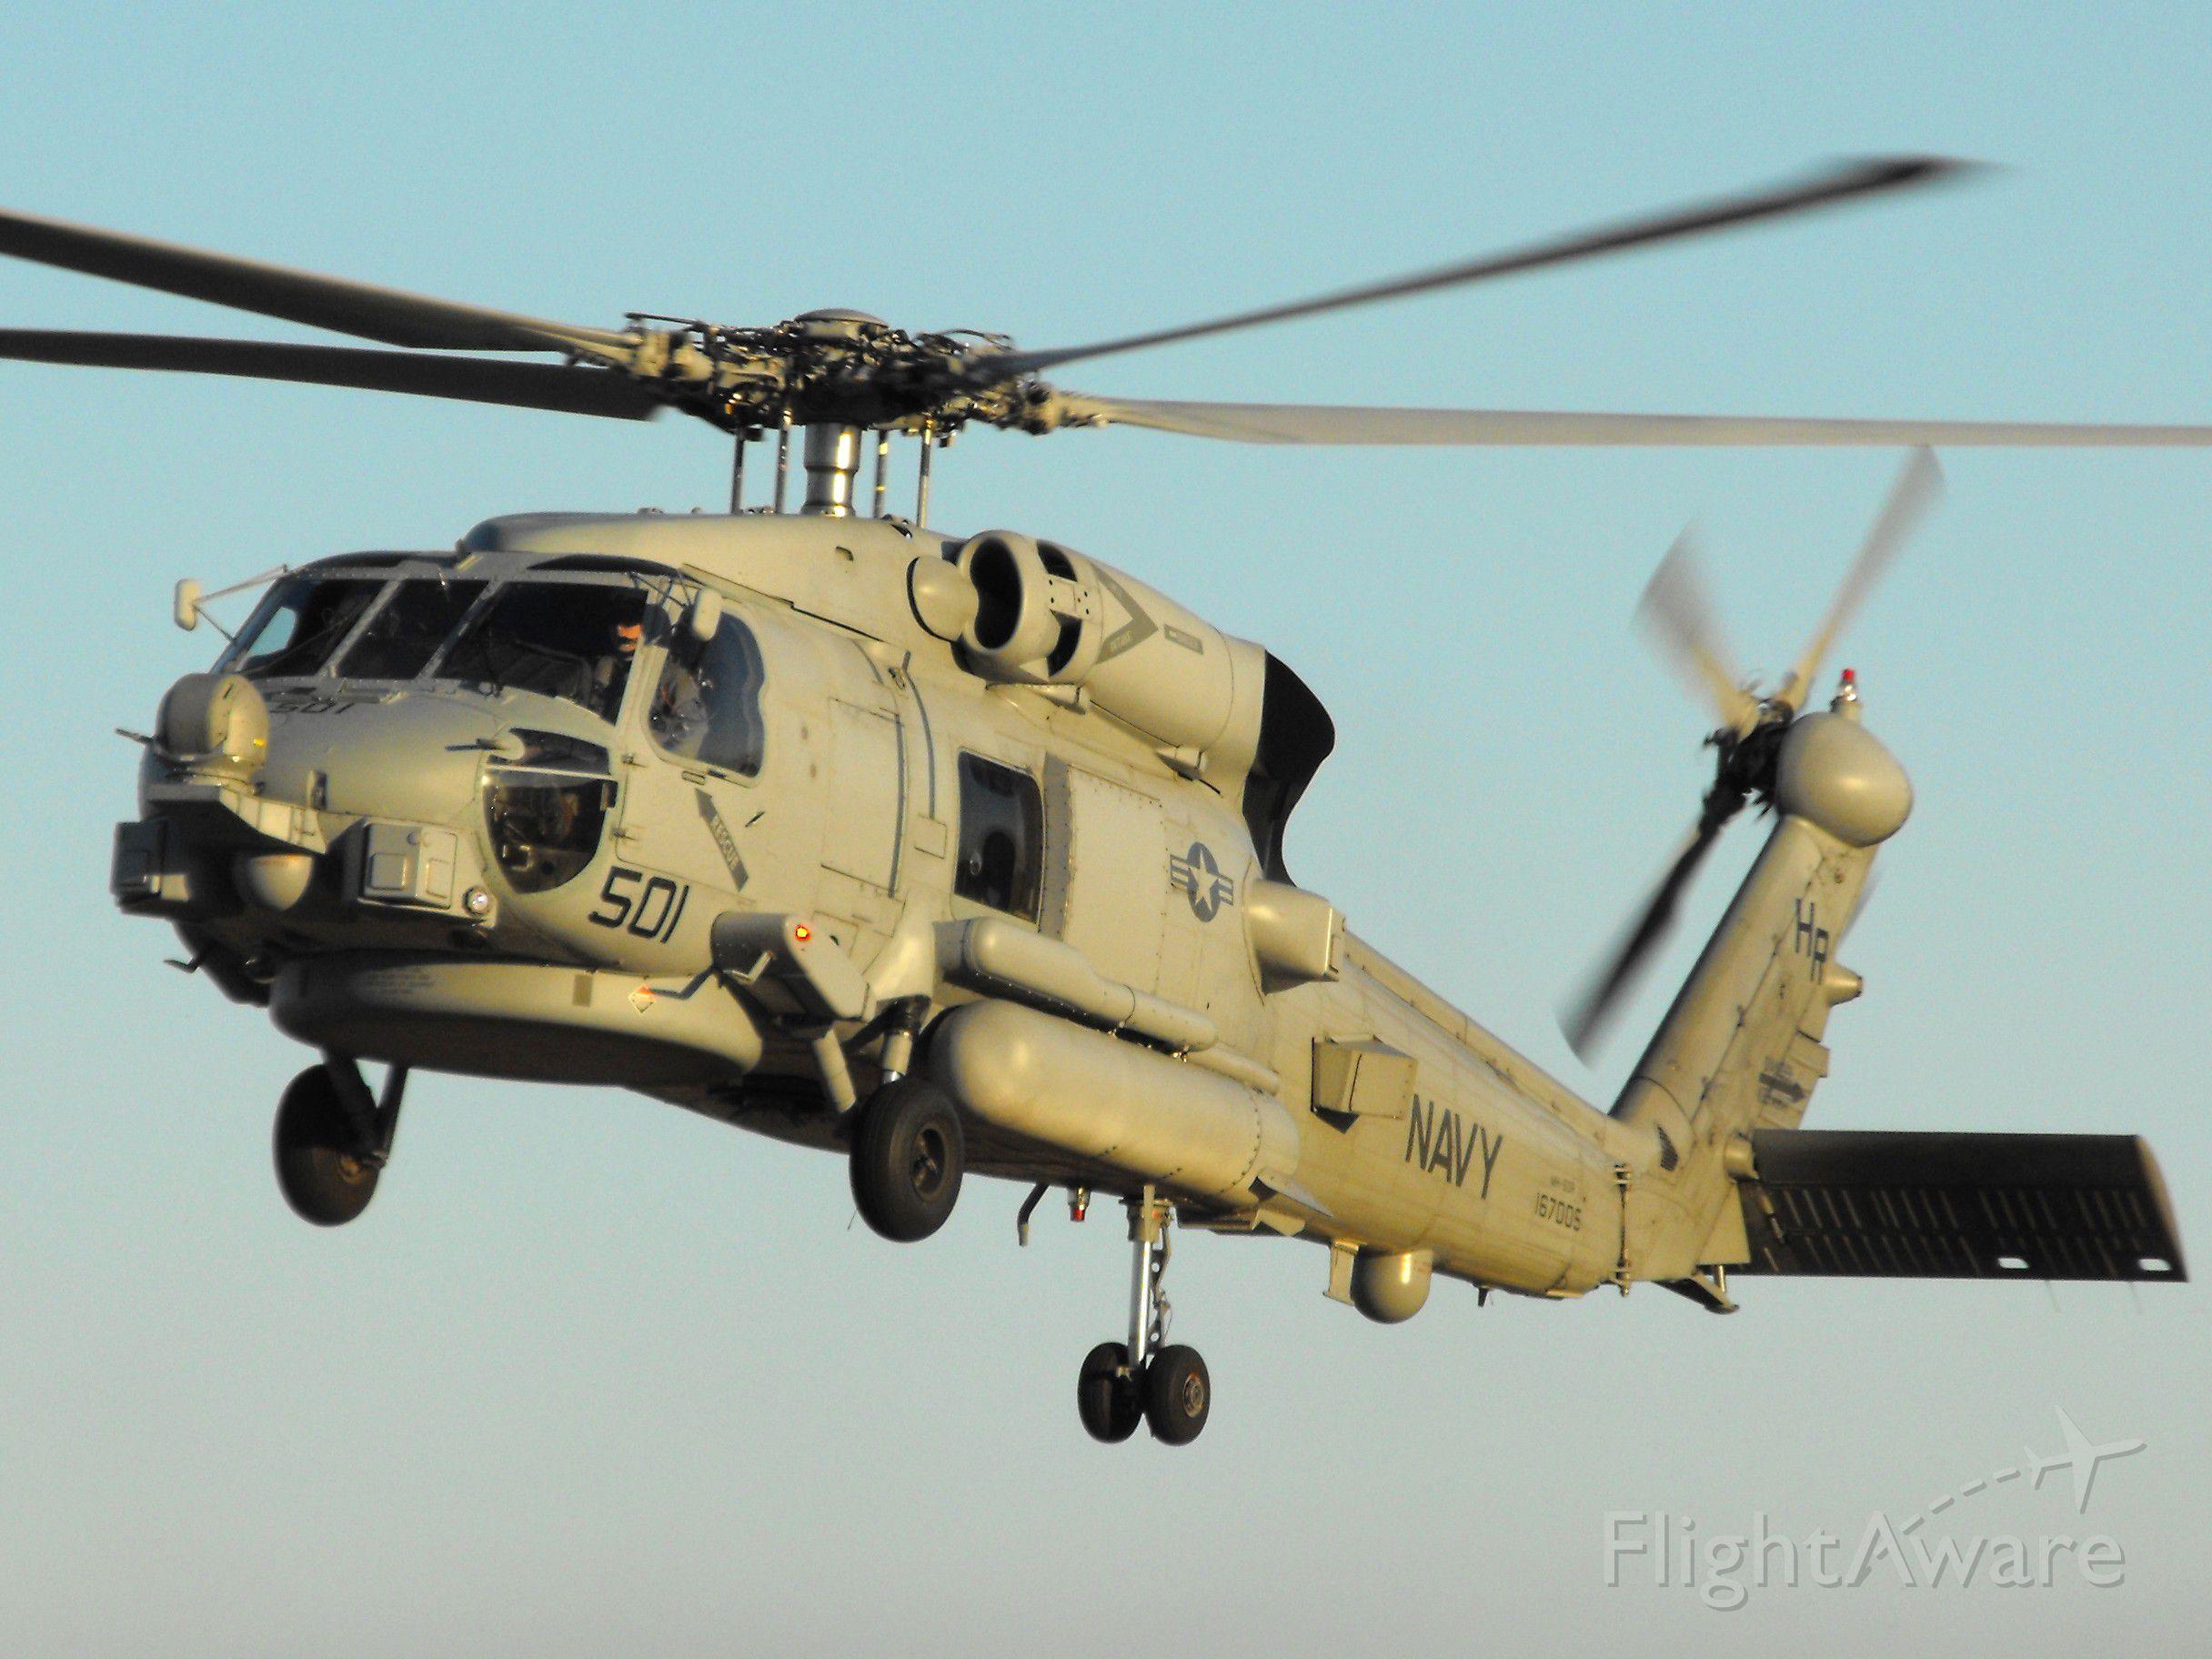 Sikorsky S-70 (16-7005) - US Navy MH-60 Seahawk landing at dusk